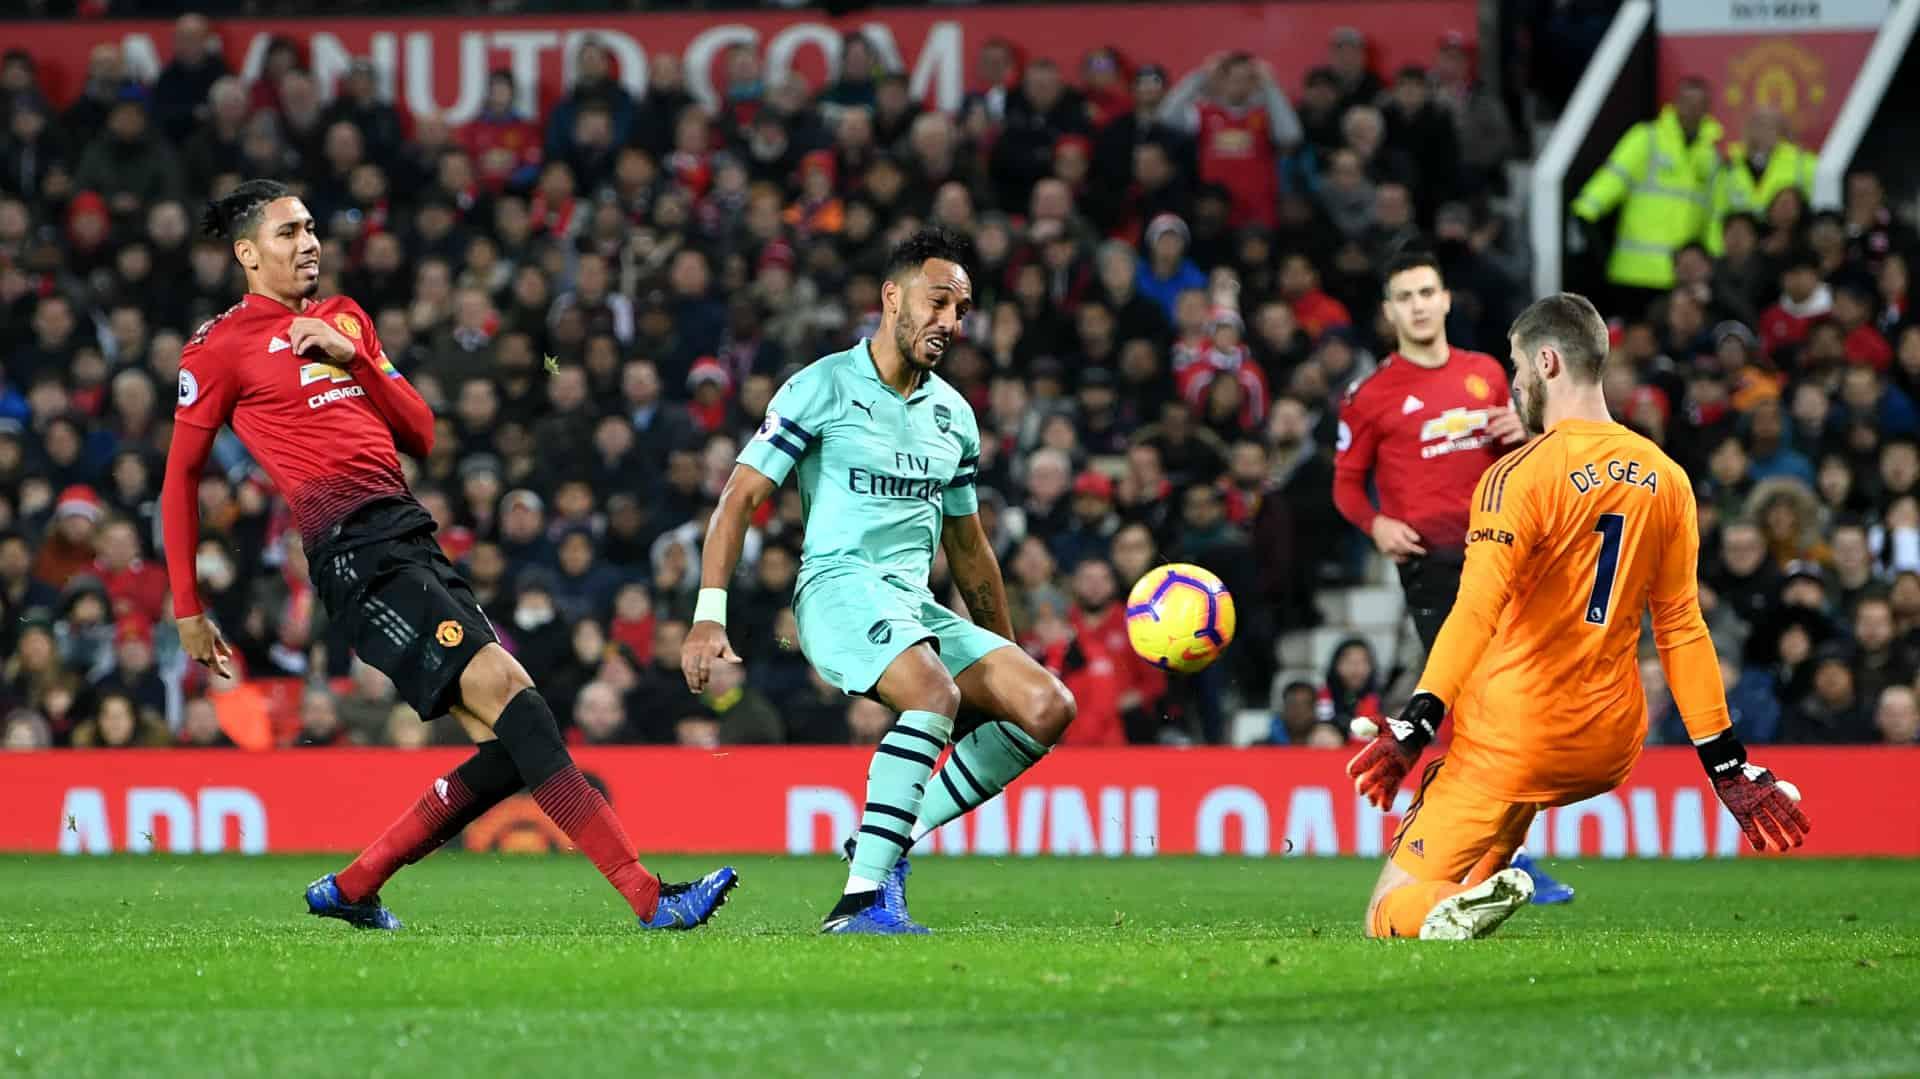 Pariurile pe Arsenal vs Manchester United